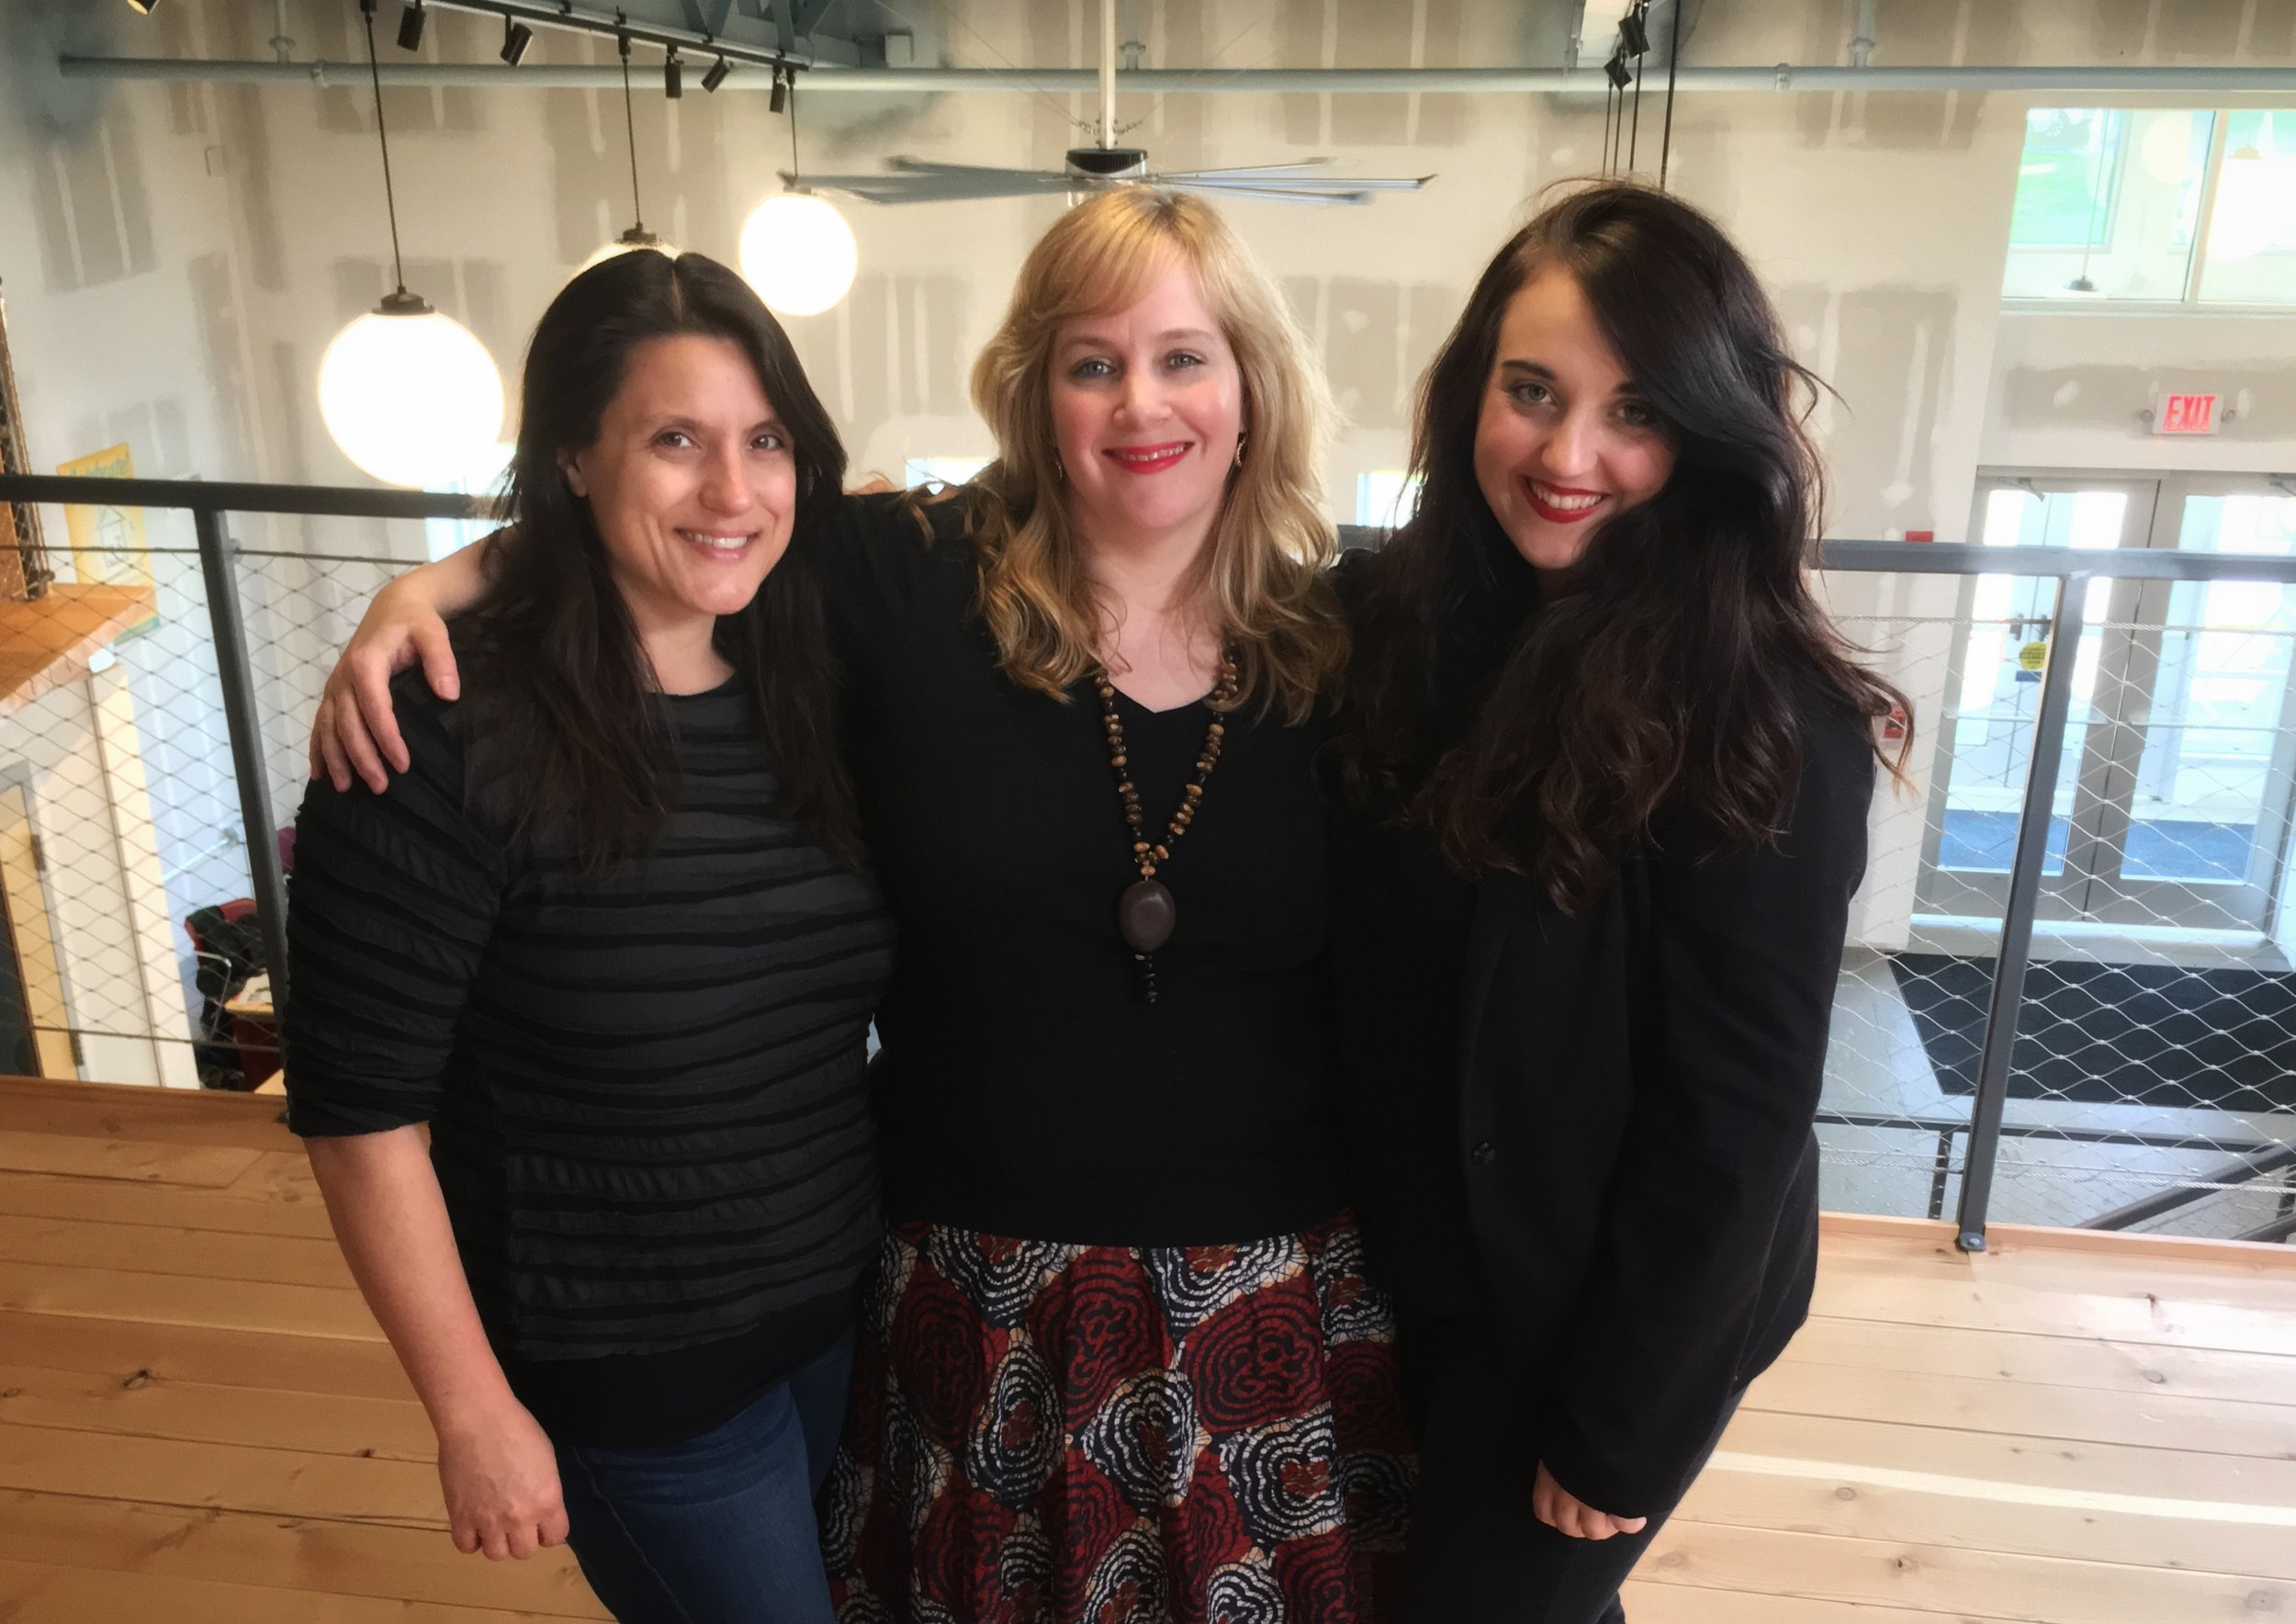 Kelly Silliman, Joanna Faraby Walker, and Melissa Dimetres. Photo by Ian Bauer.